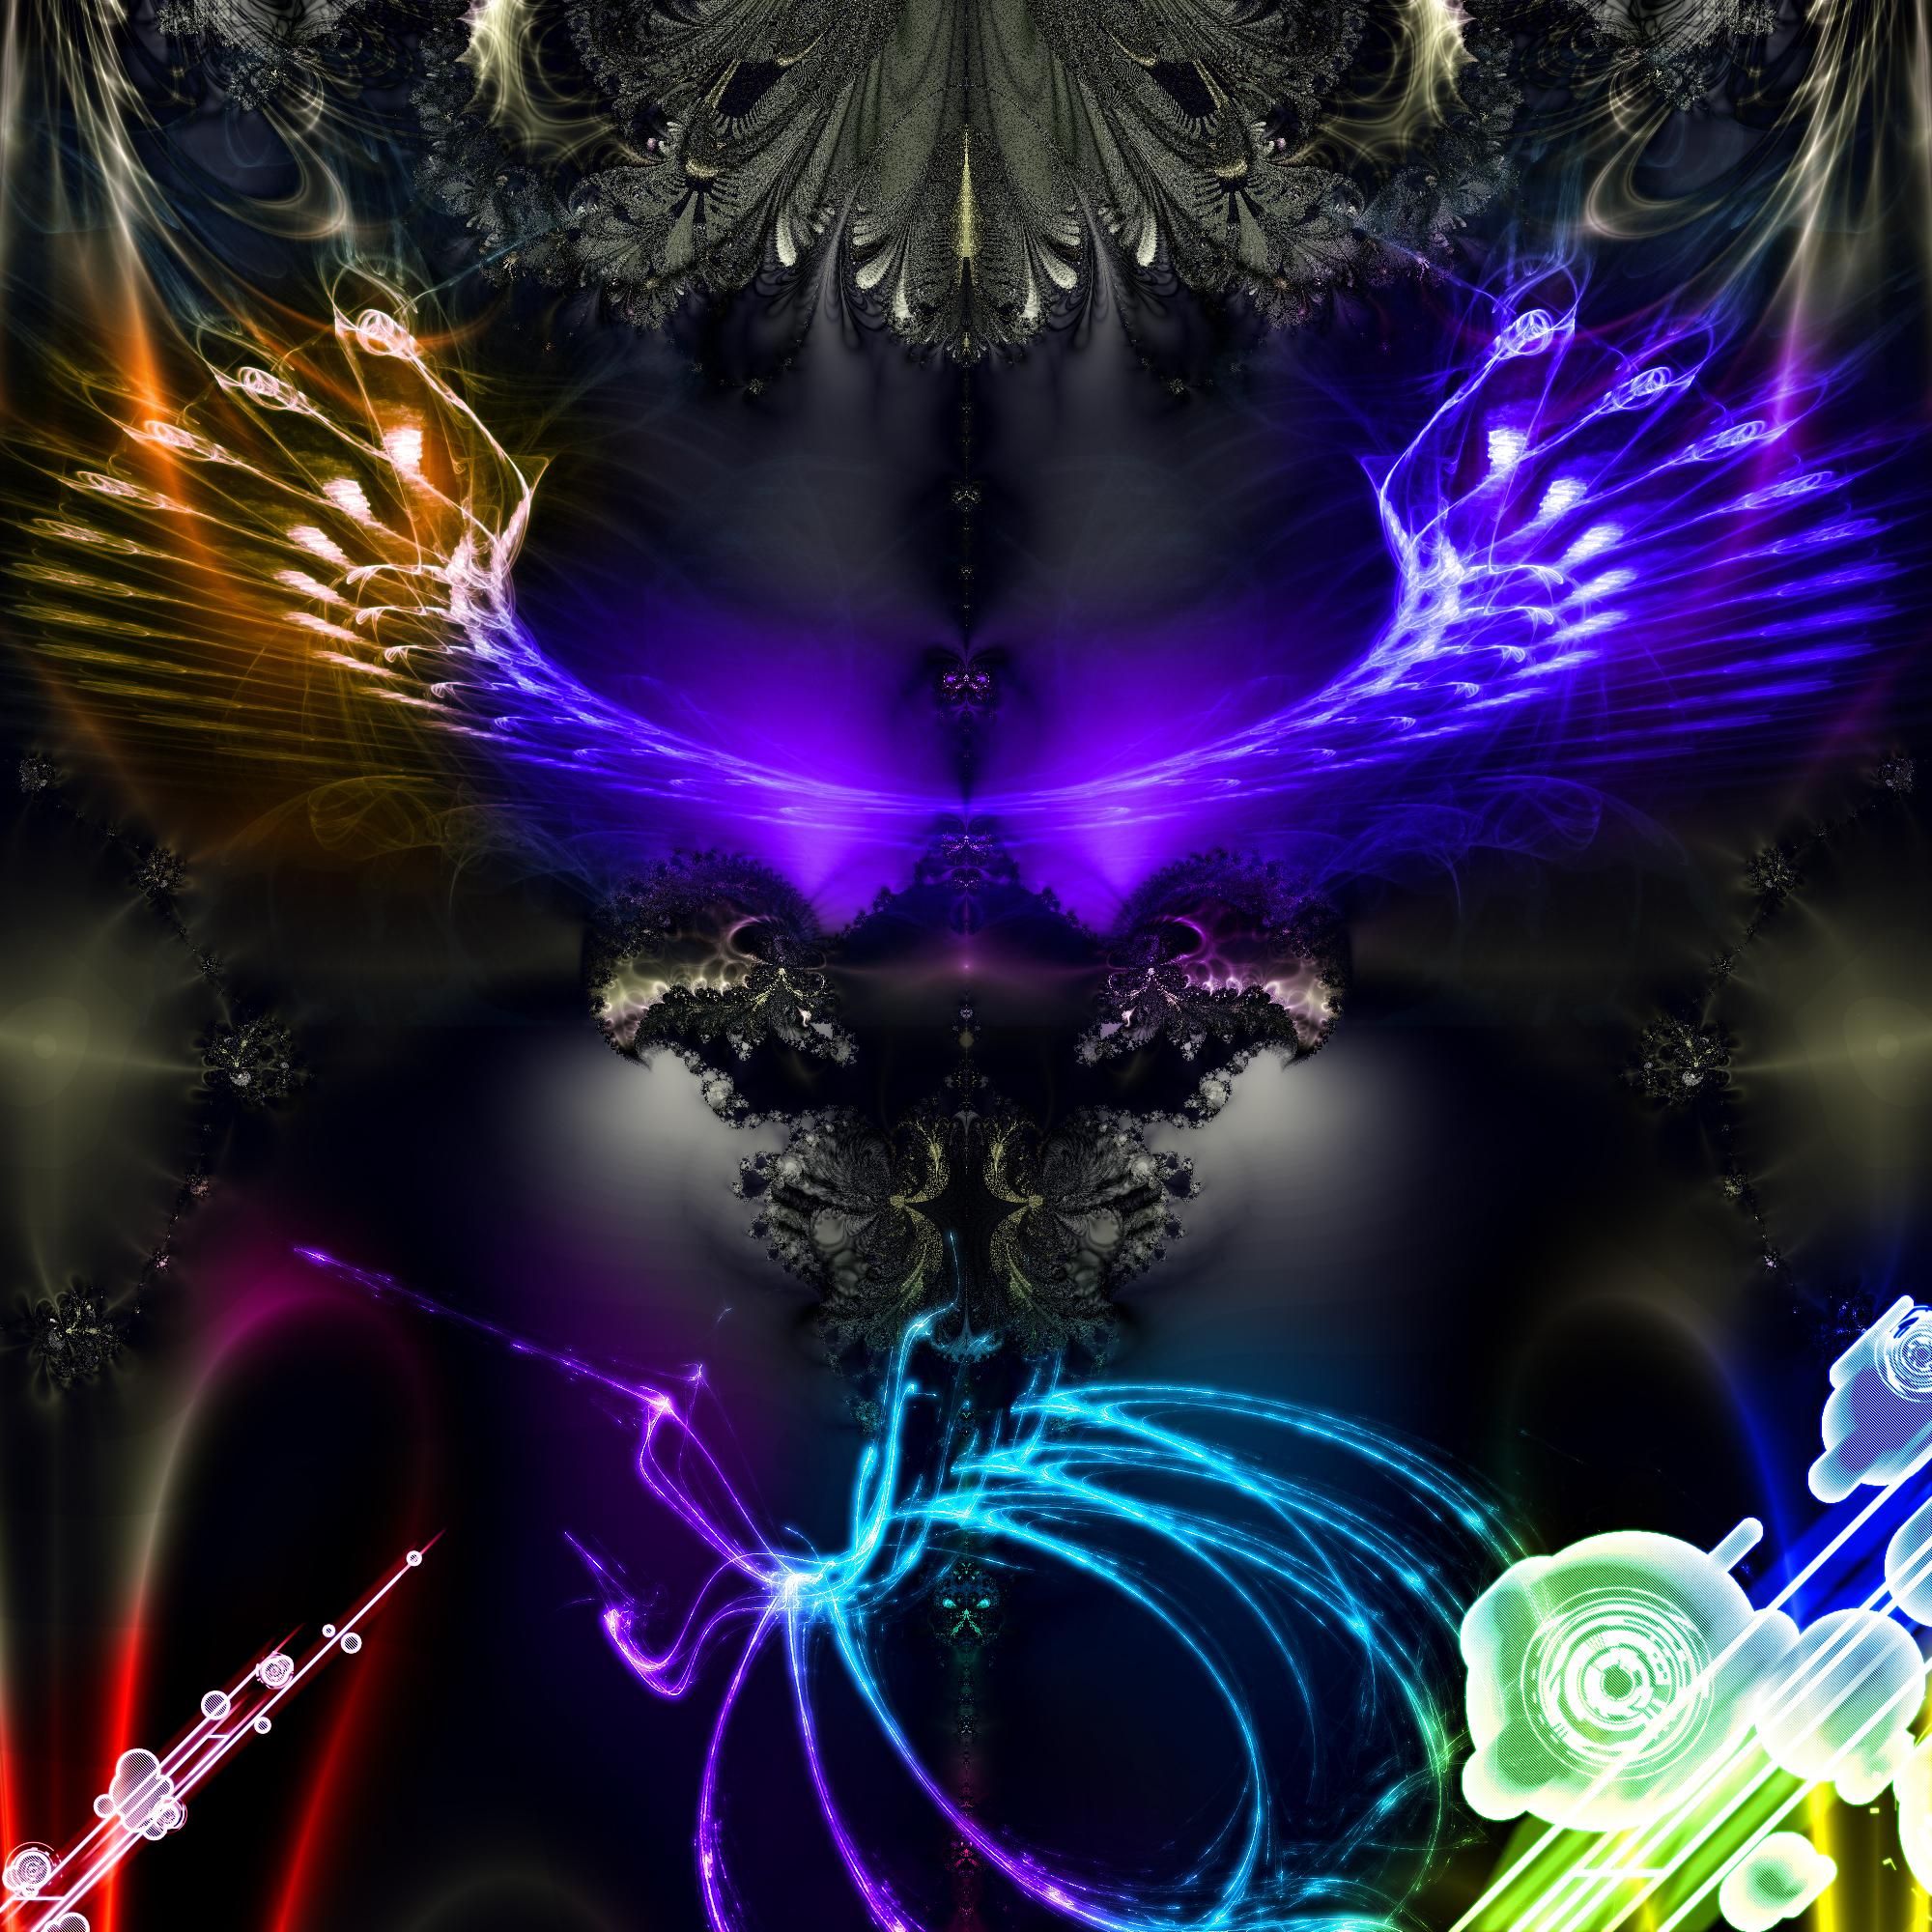 Fractals and Light